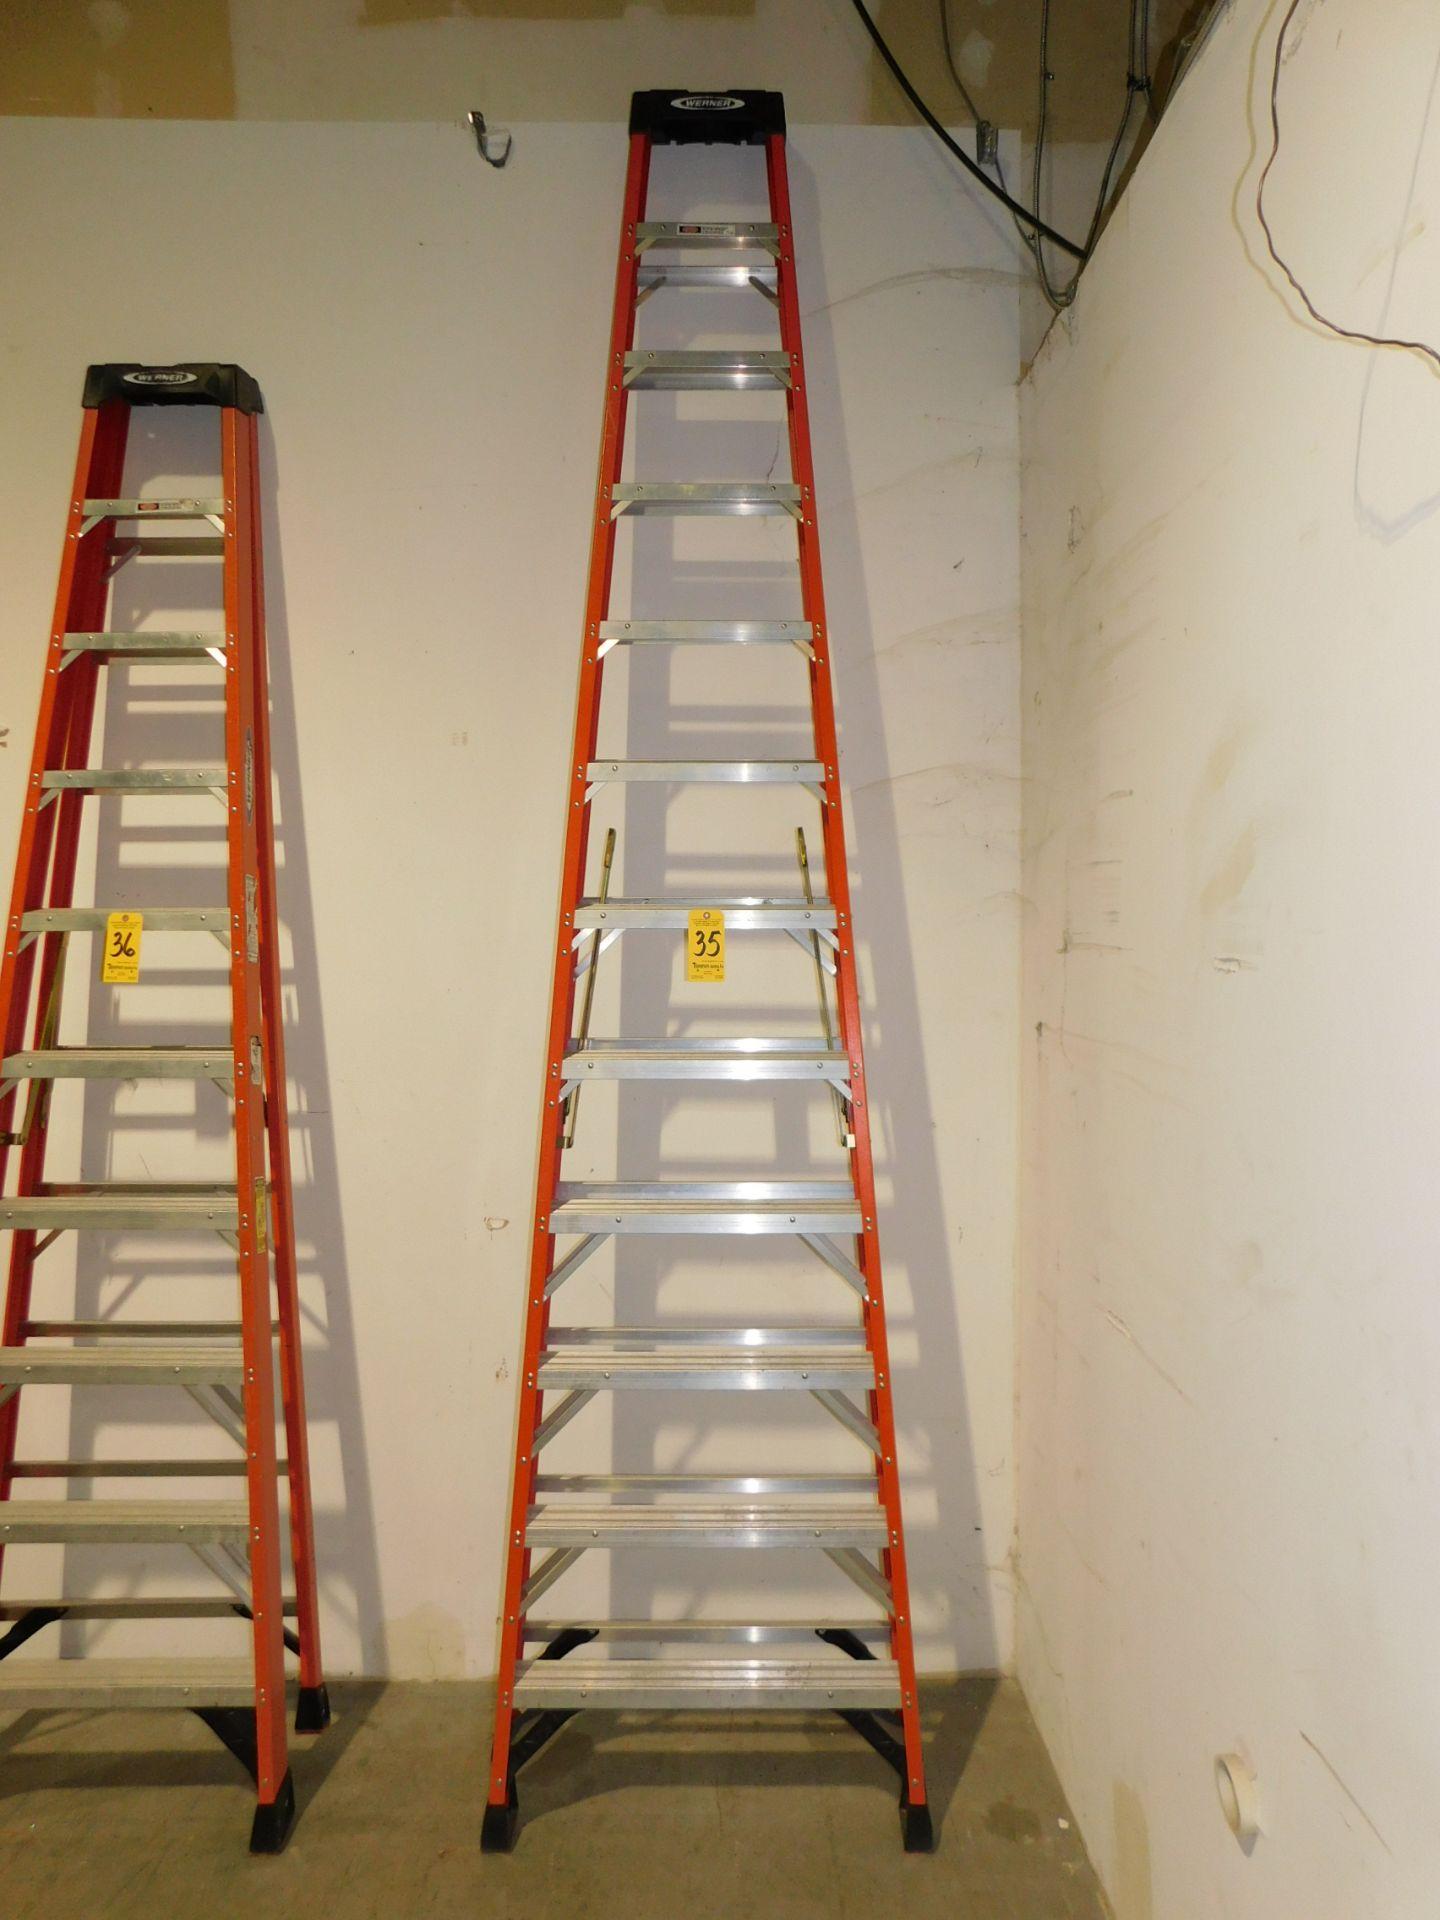 Lot 35 - Werner 12' Fiberglass Step Ladder